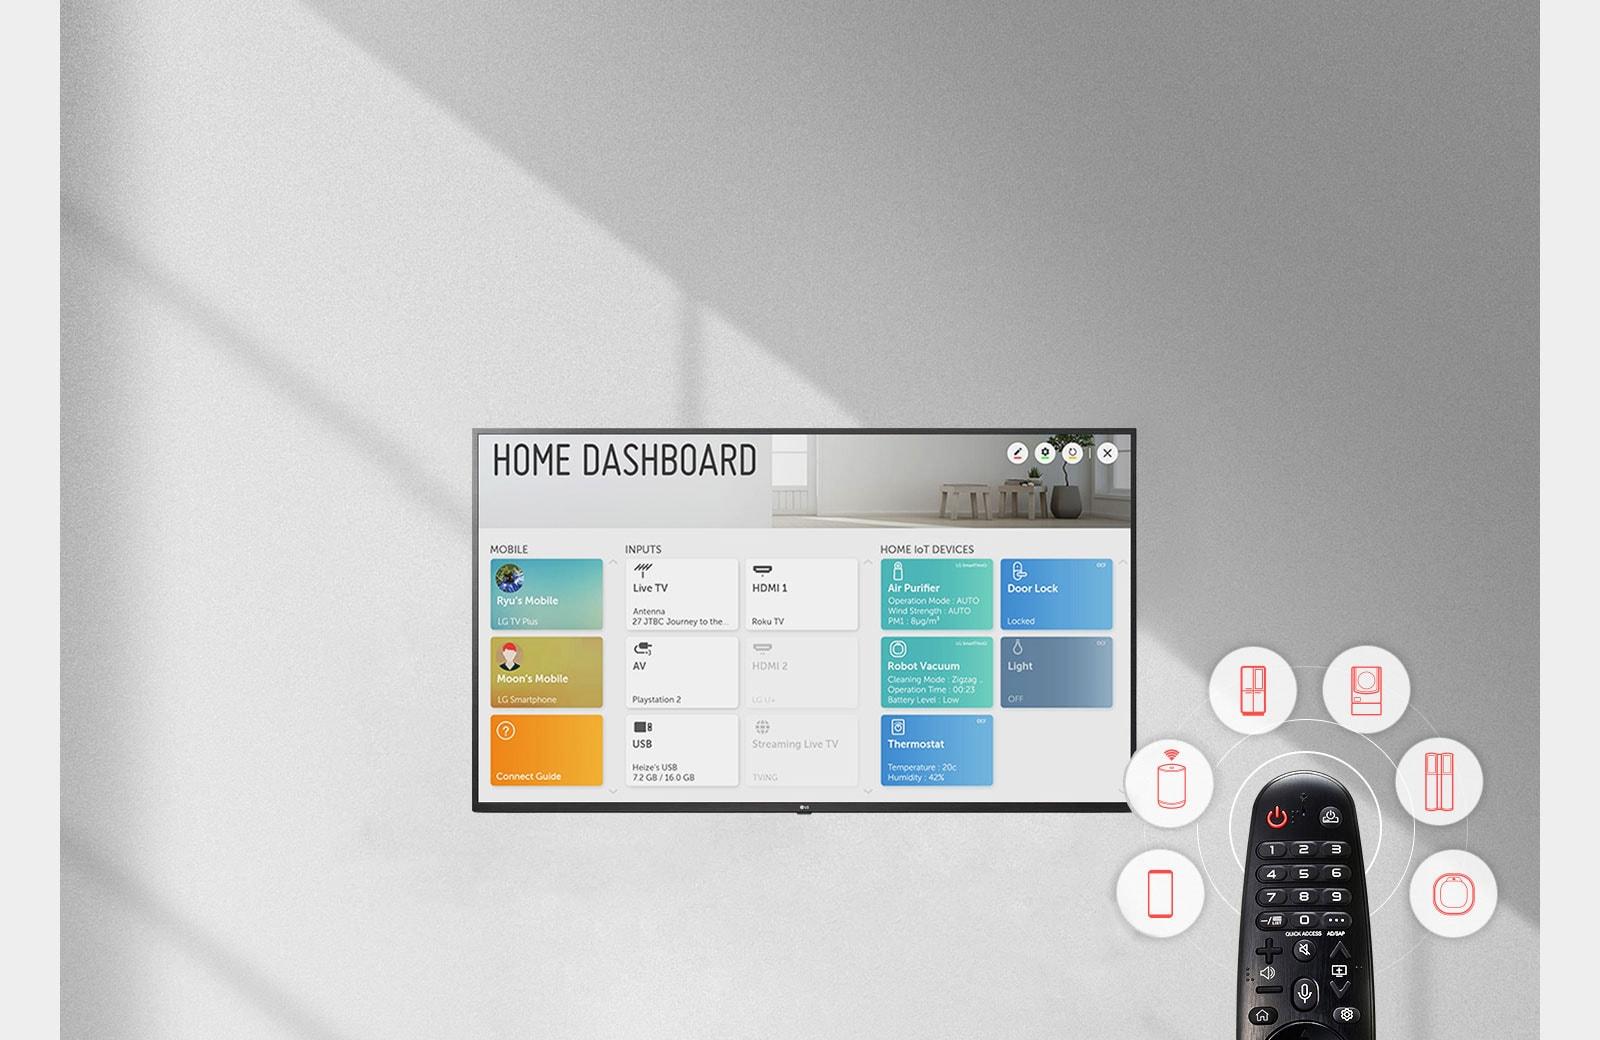 LG Ultra HD TV Home Dashboard